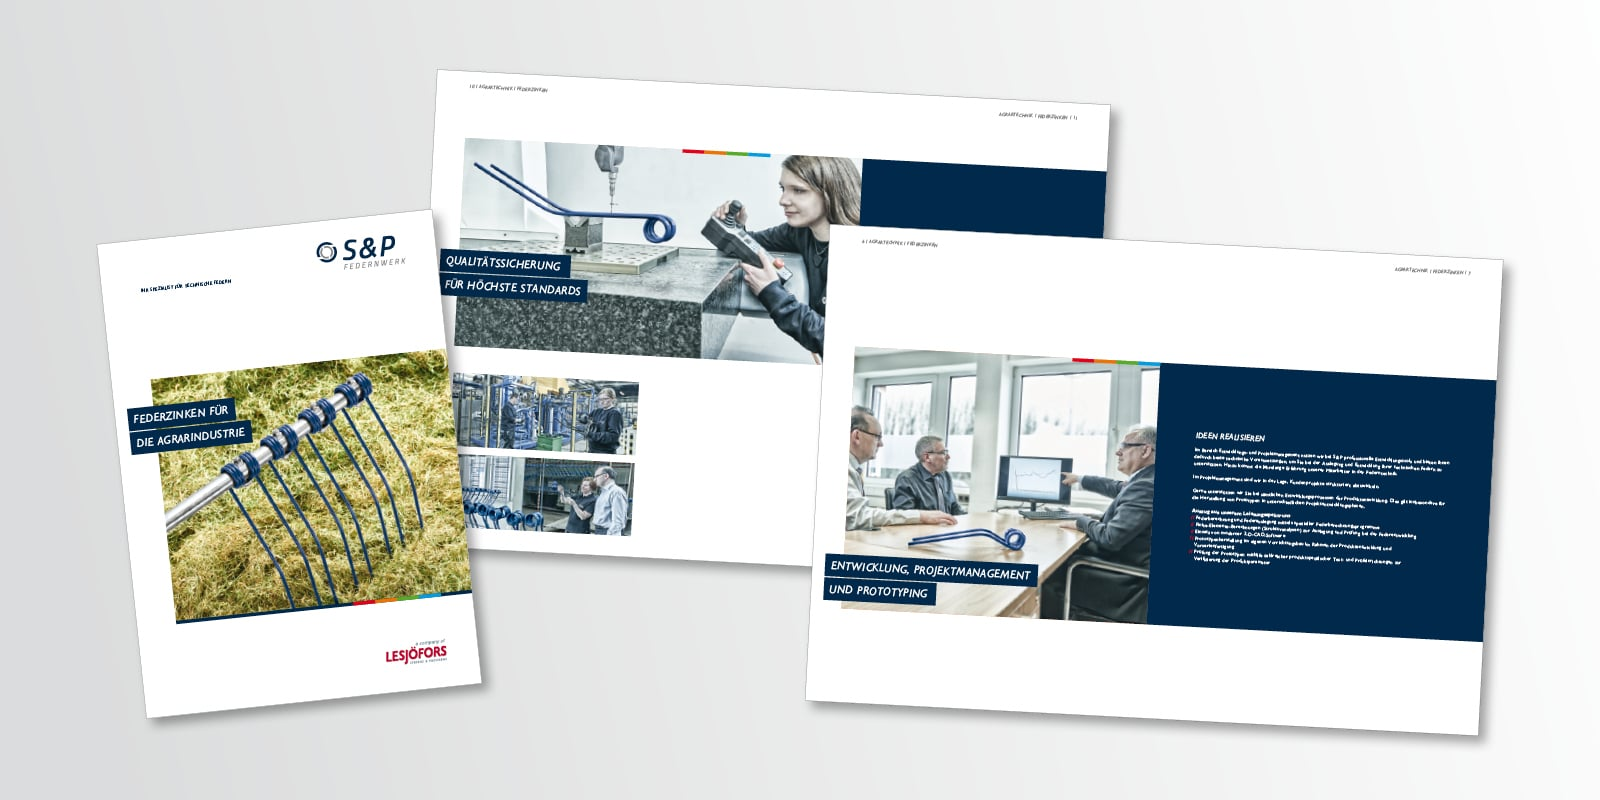 Econ Megaphon Award – Lesjöfors Industrial Springs & Pressings: Print und Digital, Corporate Design